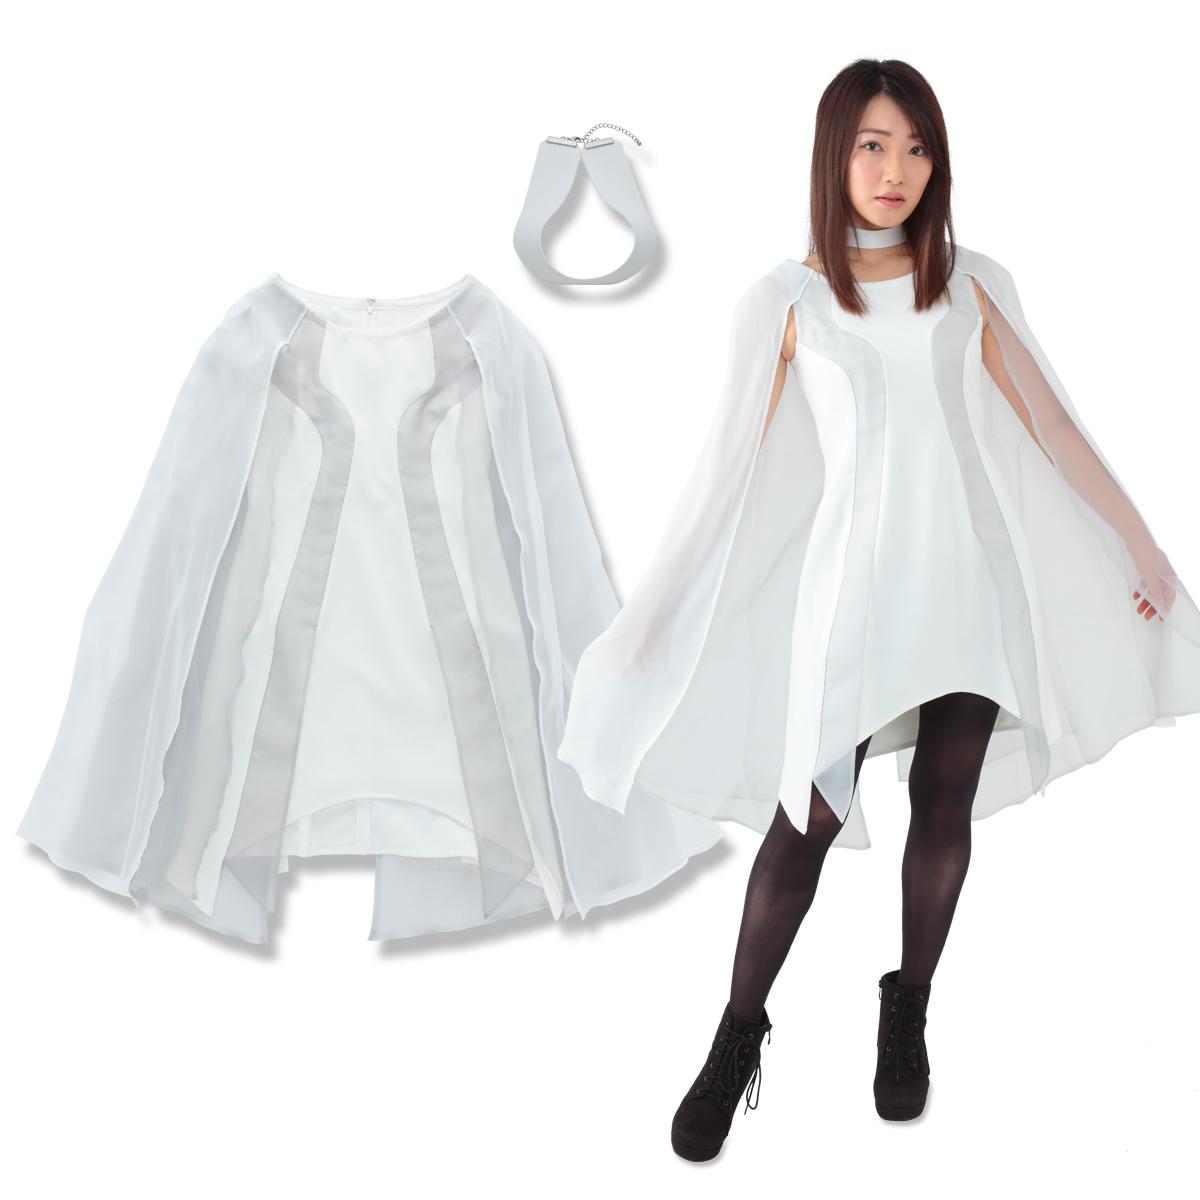 KAMEN RIDER ZI-O Cosplay One-piece dress (Tsukuyomi)